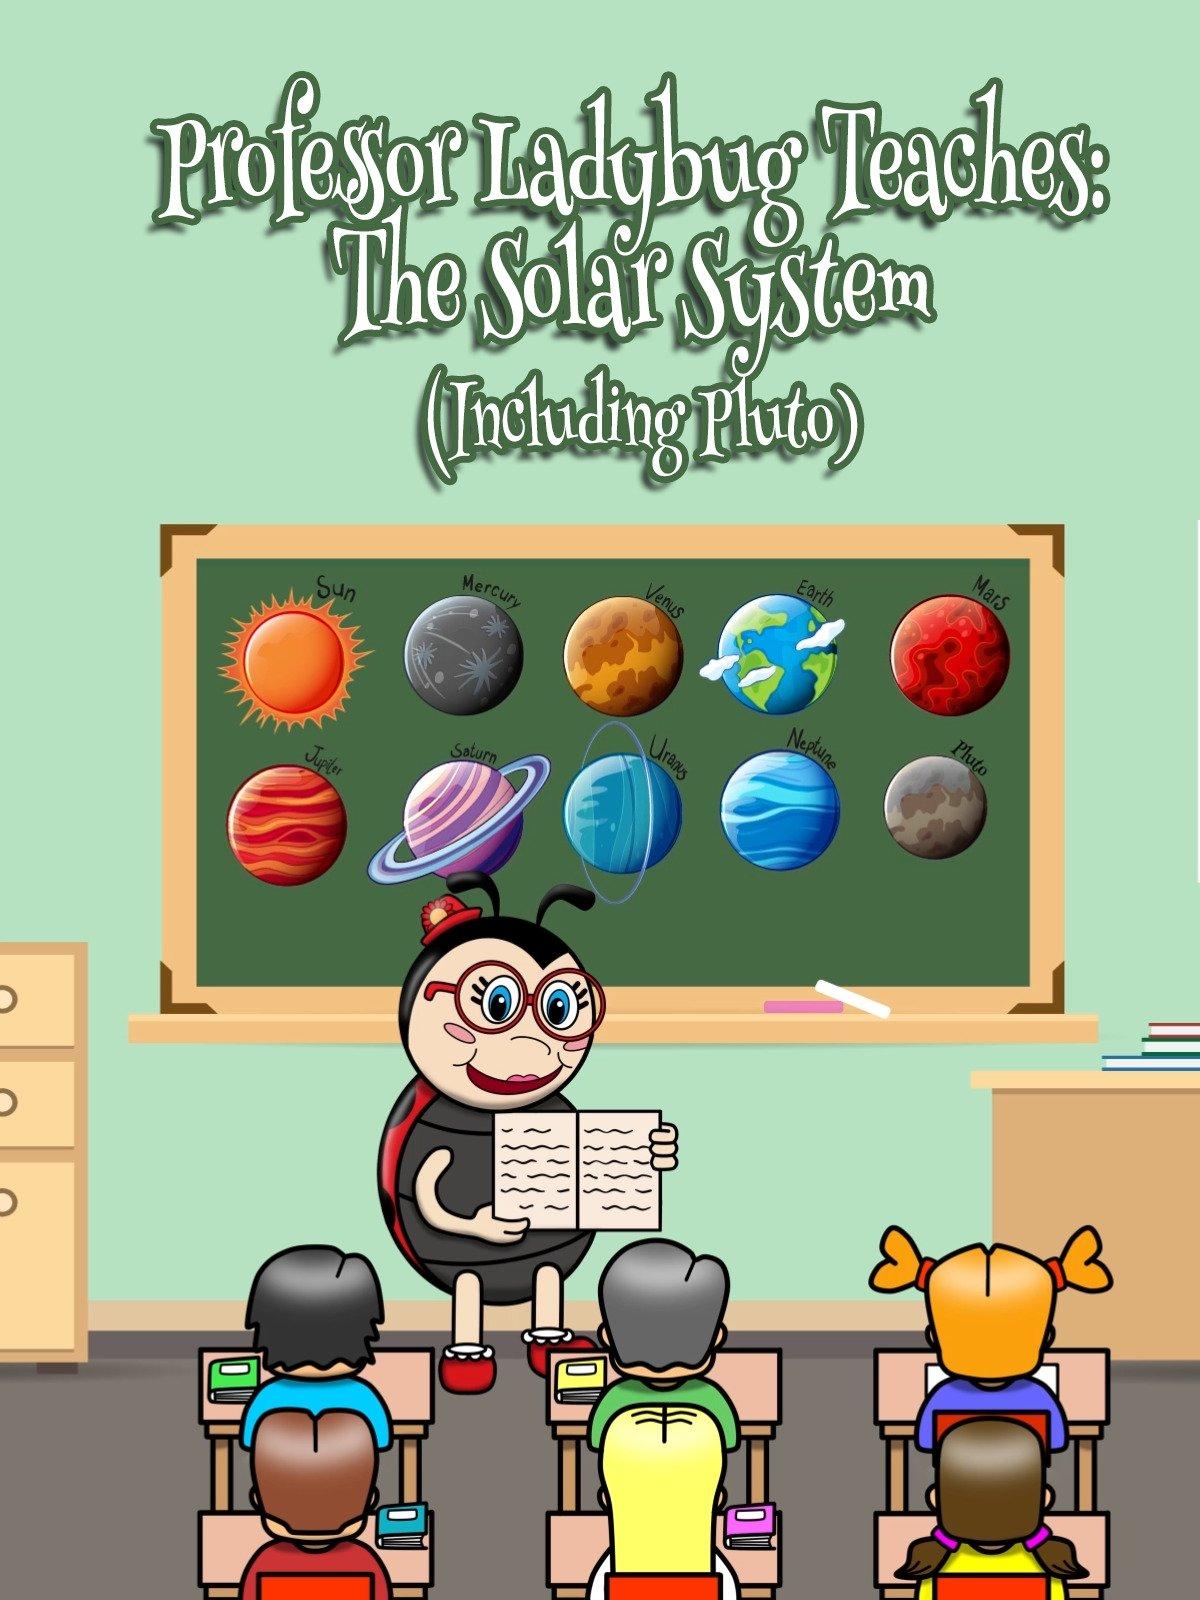 Professor Ladybug Teaches: The Solar System (Including Pluto)